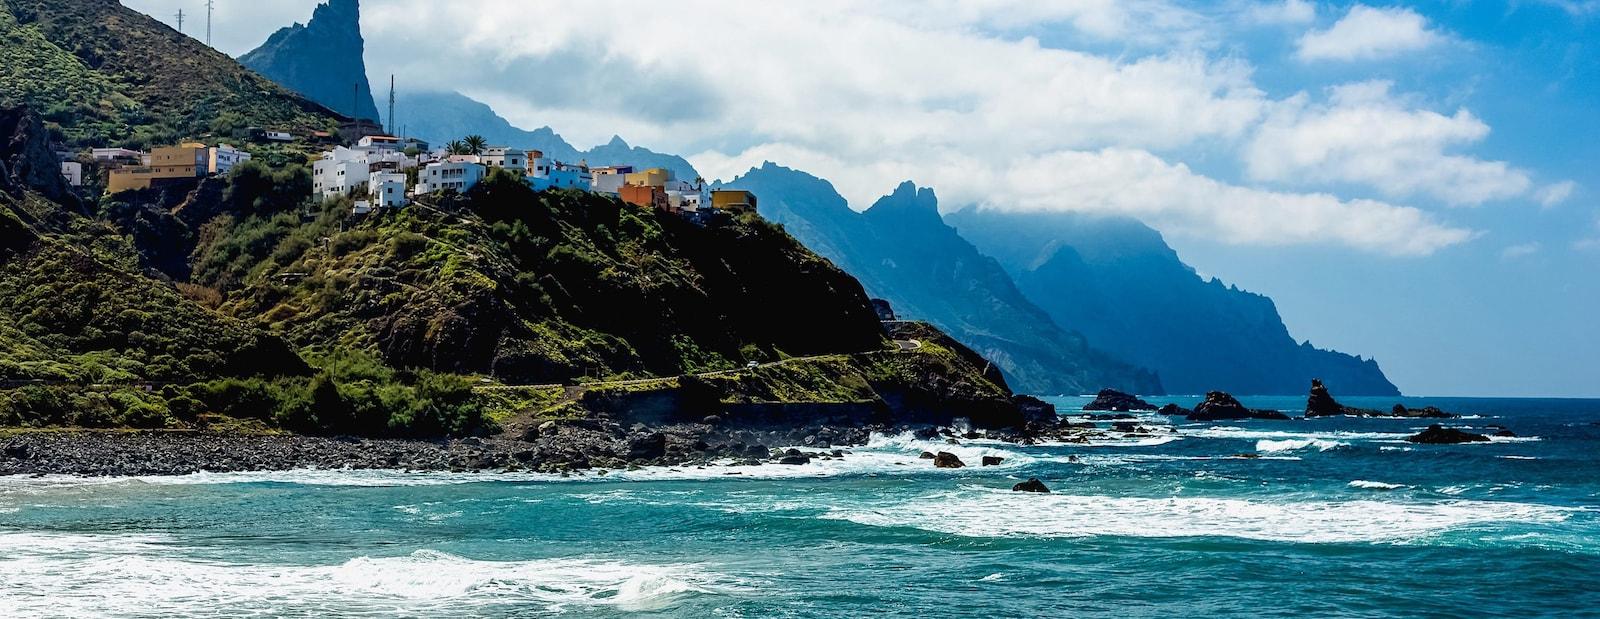 Playa de las Américas的度假屋